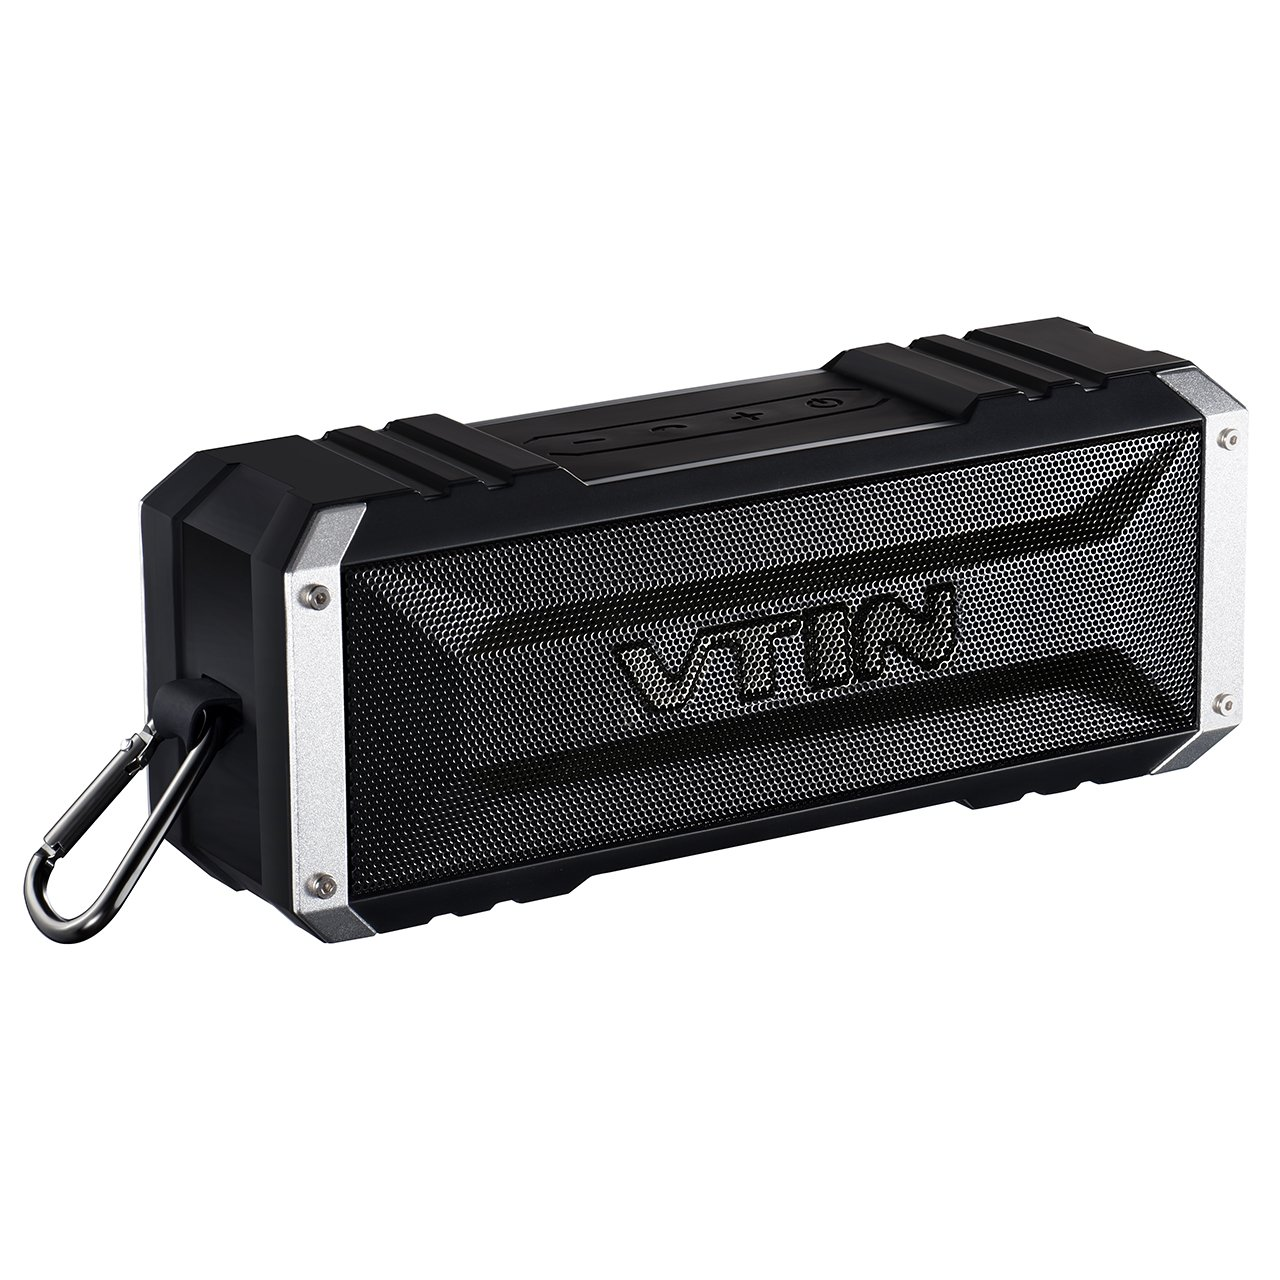 Amazon.com: Vtin 20 Watt Waterproof Bluetooth Speaker, 25 Hours ...